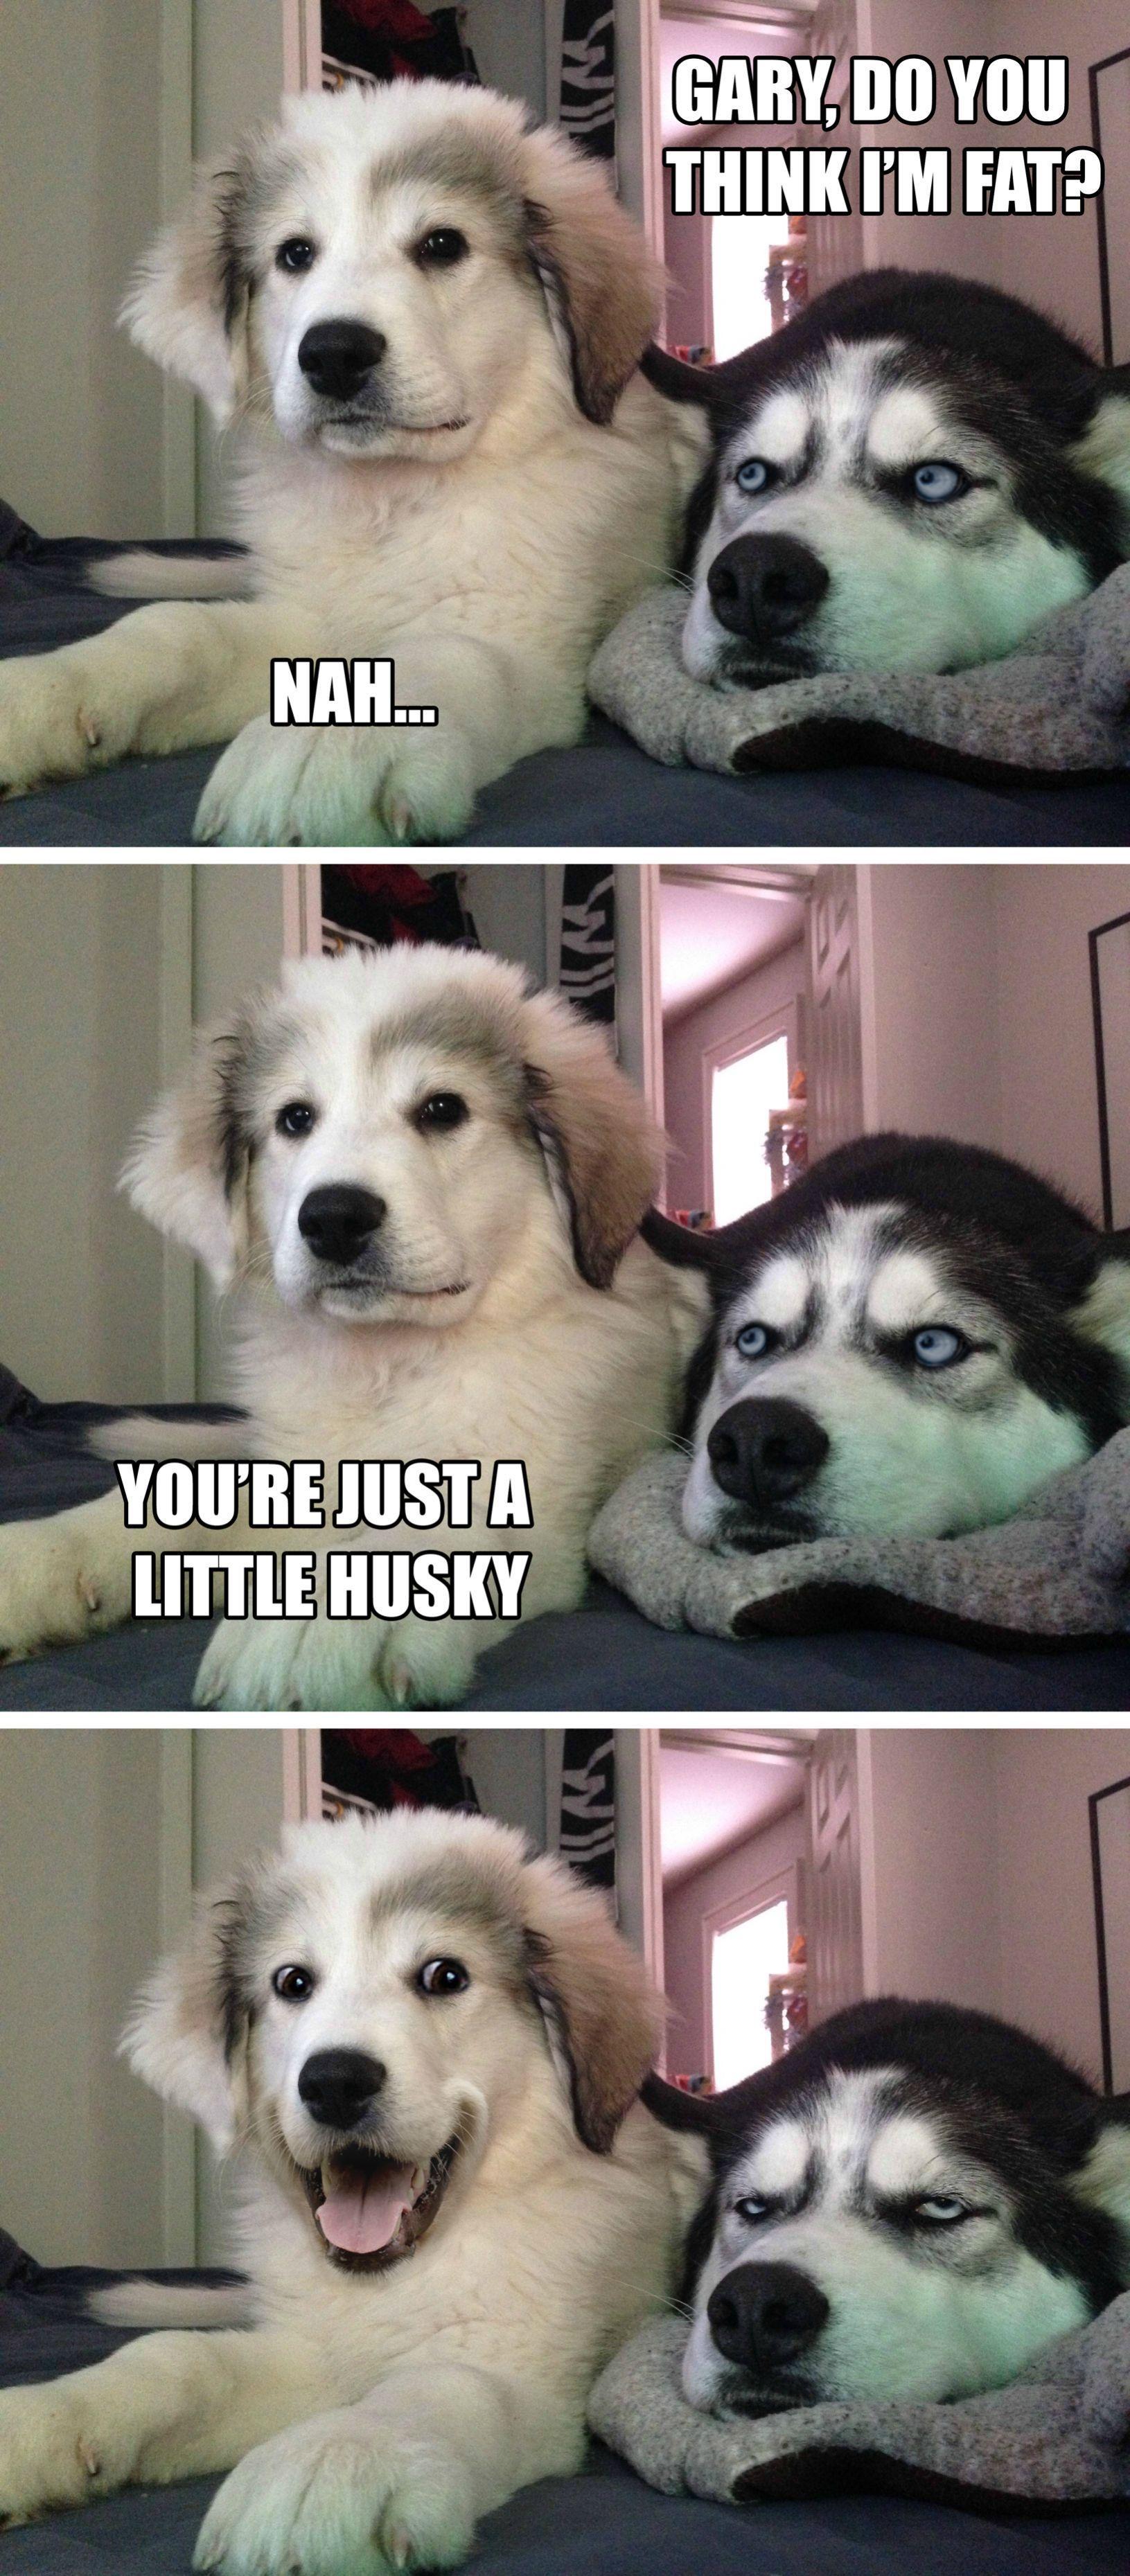 Gary S Getting The Hang Of It Lolsnaps Dog Jokes Dog Memes Clean Dog Puns